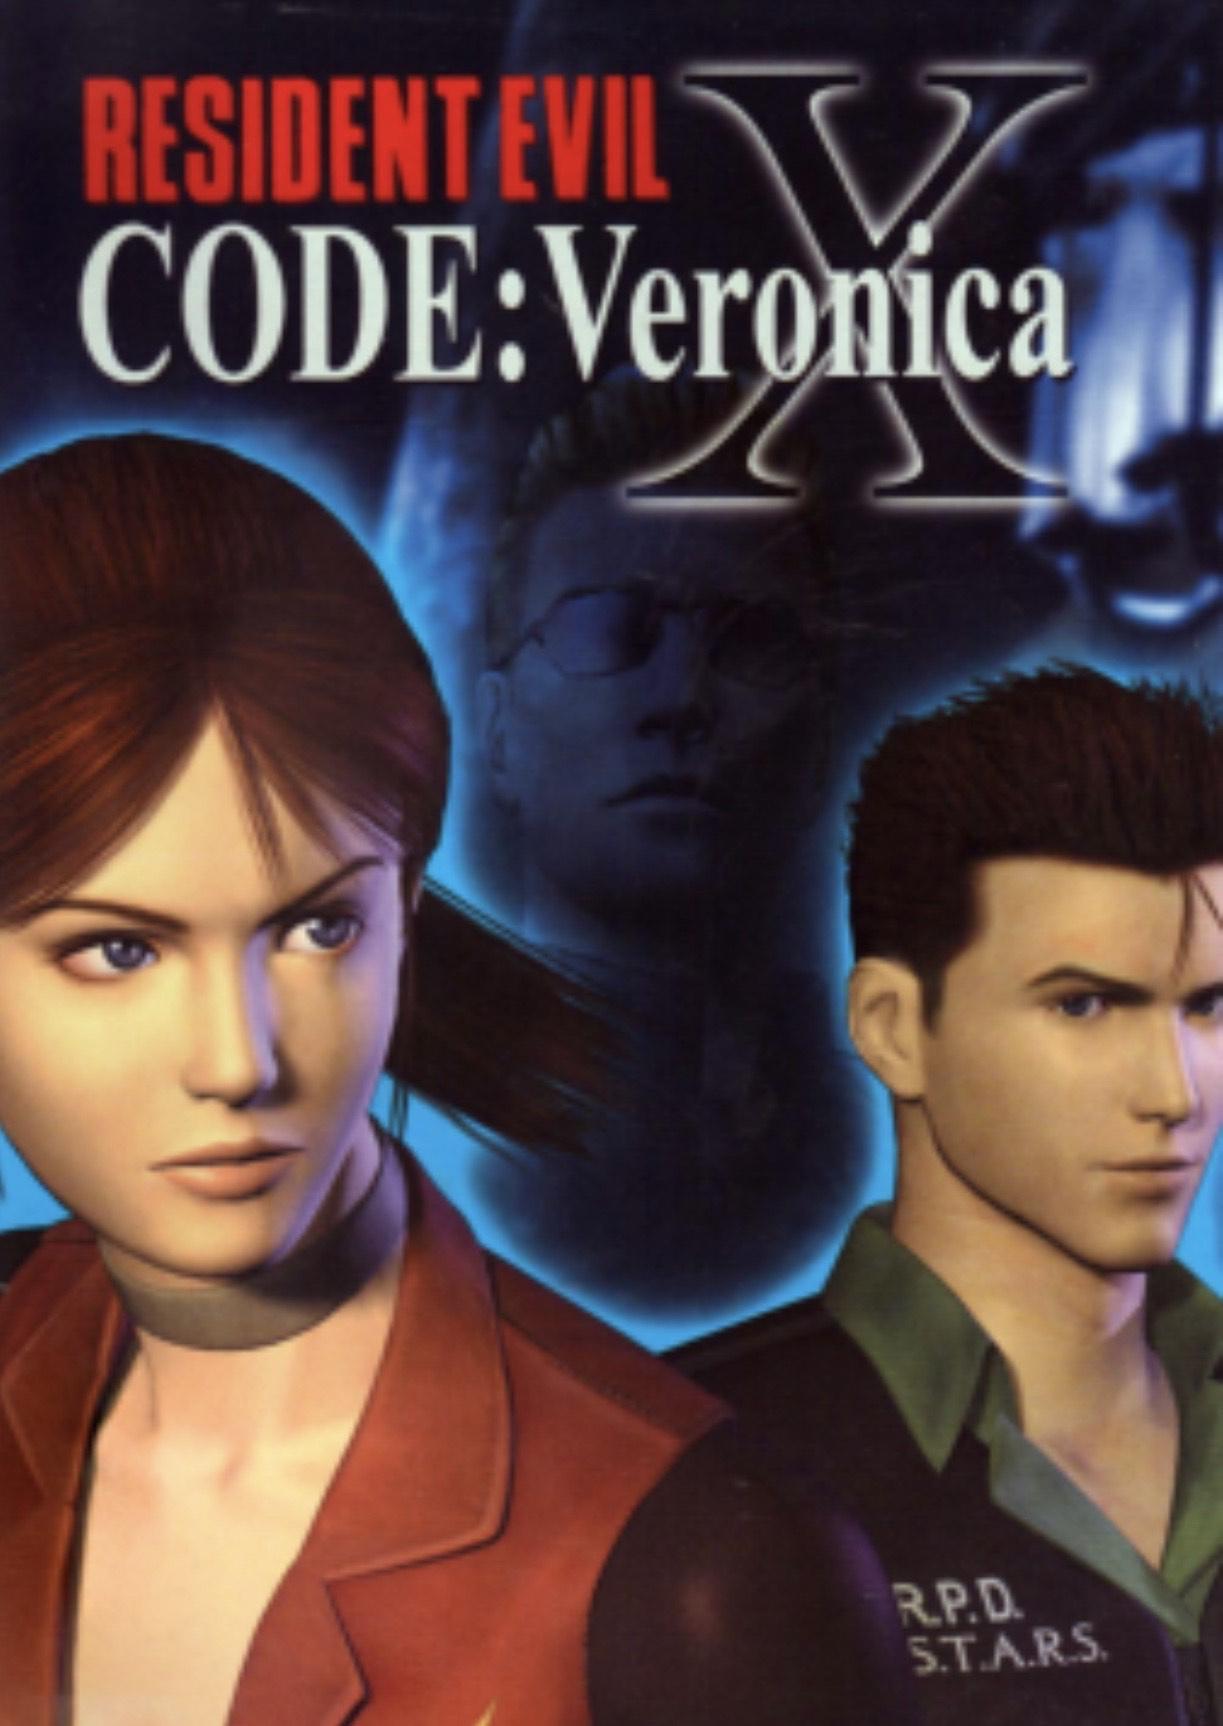 Resident Evil Code: Veronica X (Xbox 360 / Xbox one) £3.74 @ Microsoft Store